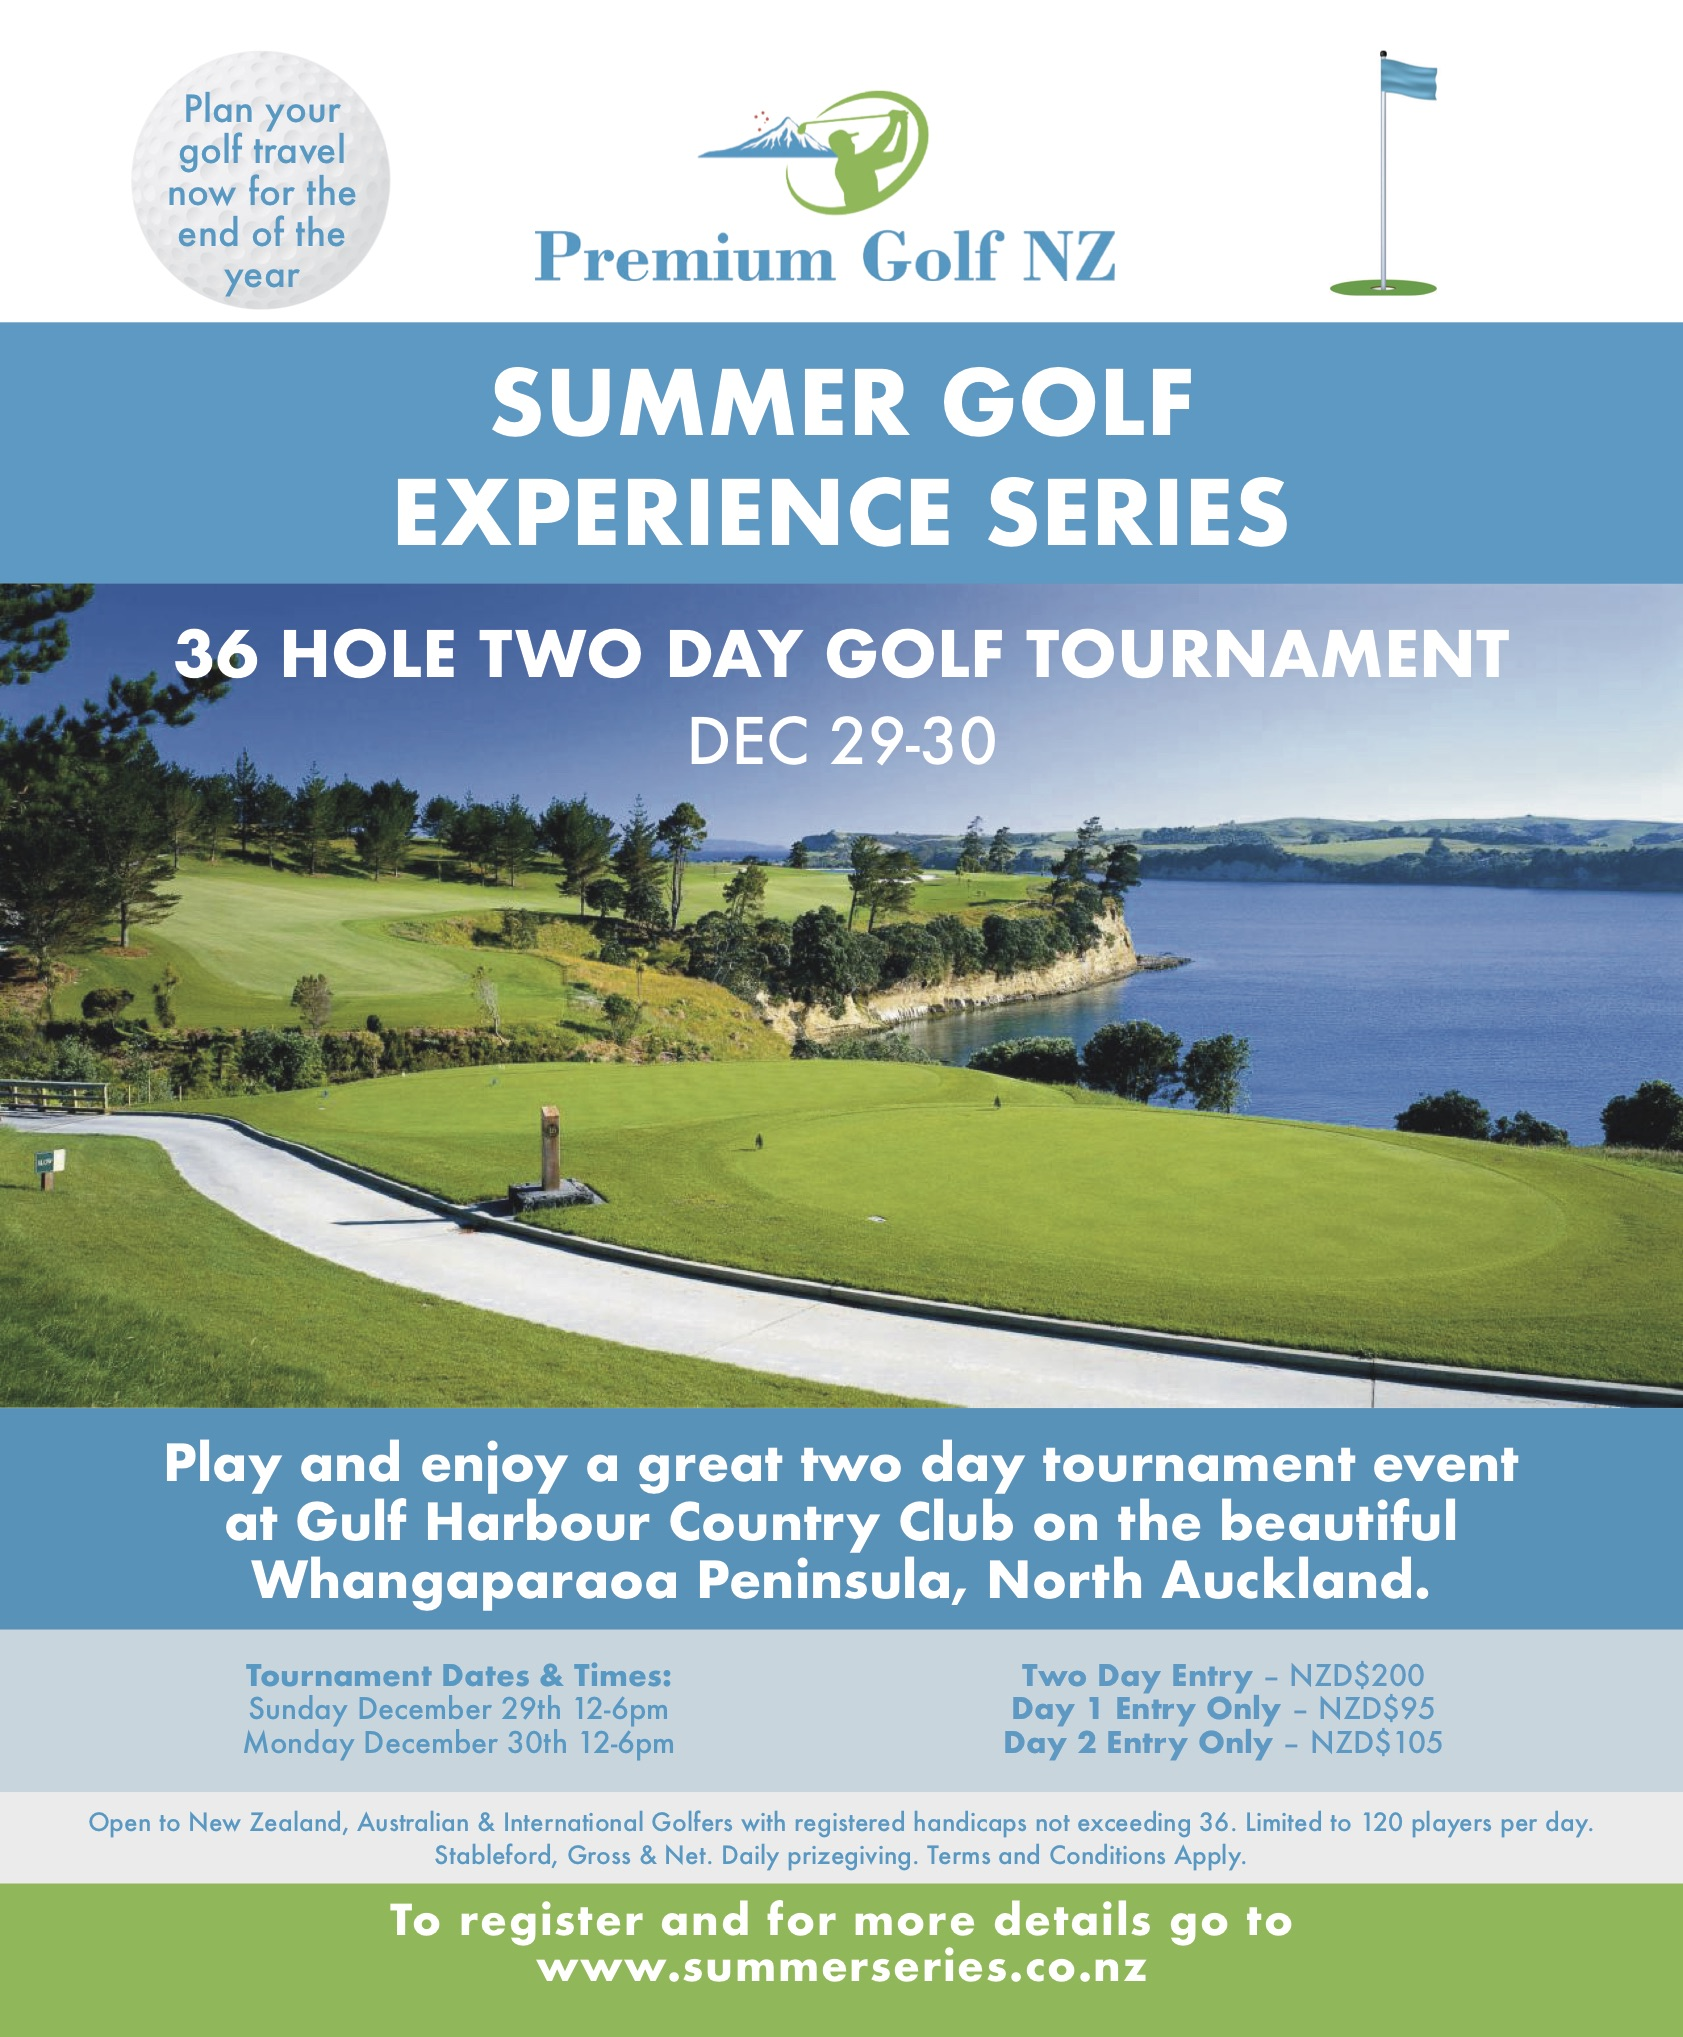 Premium Golf FULL PAGE 201906.jpg